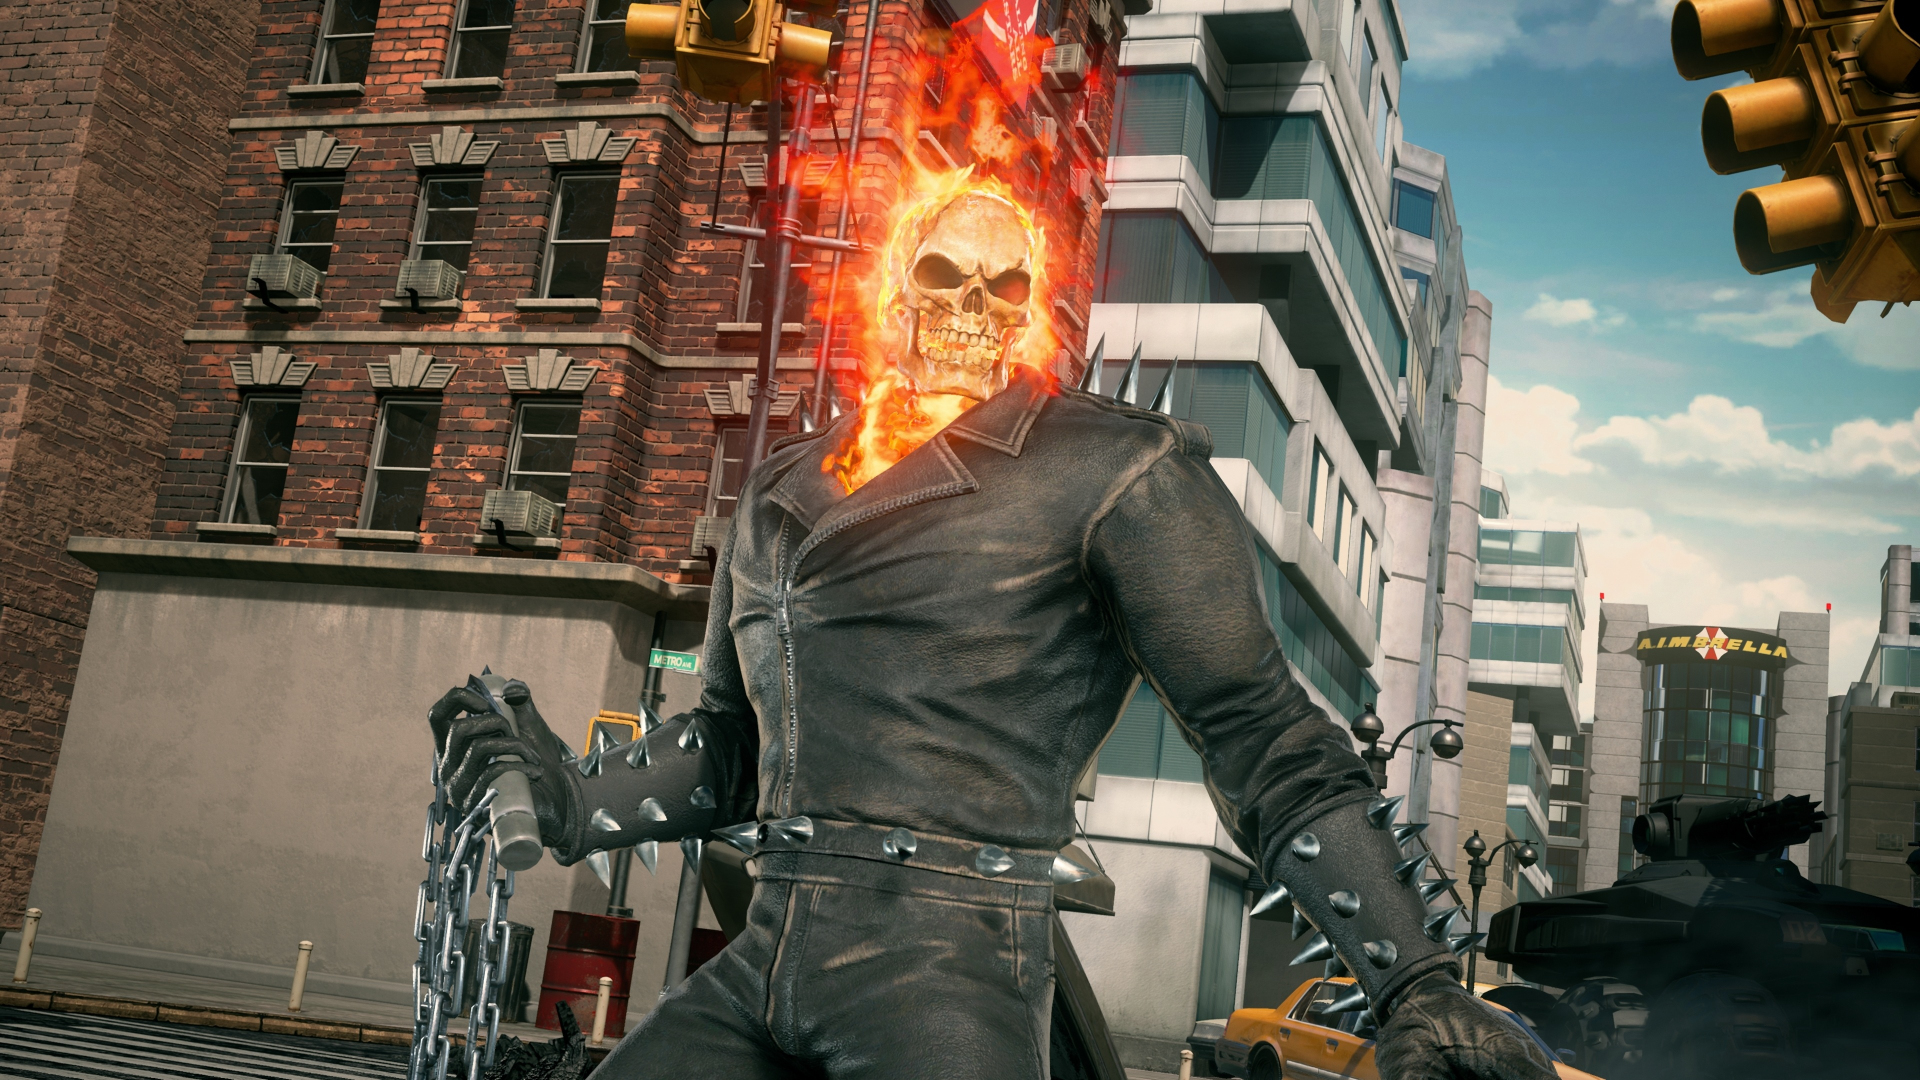 Download 1920x1080 Wallpaper Ghost Rider New Marvel Vs Capcom